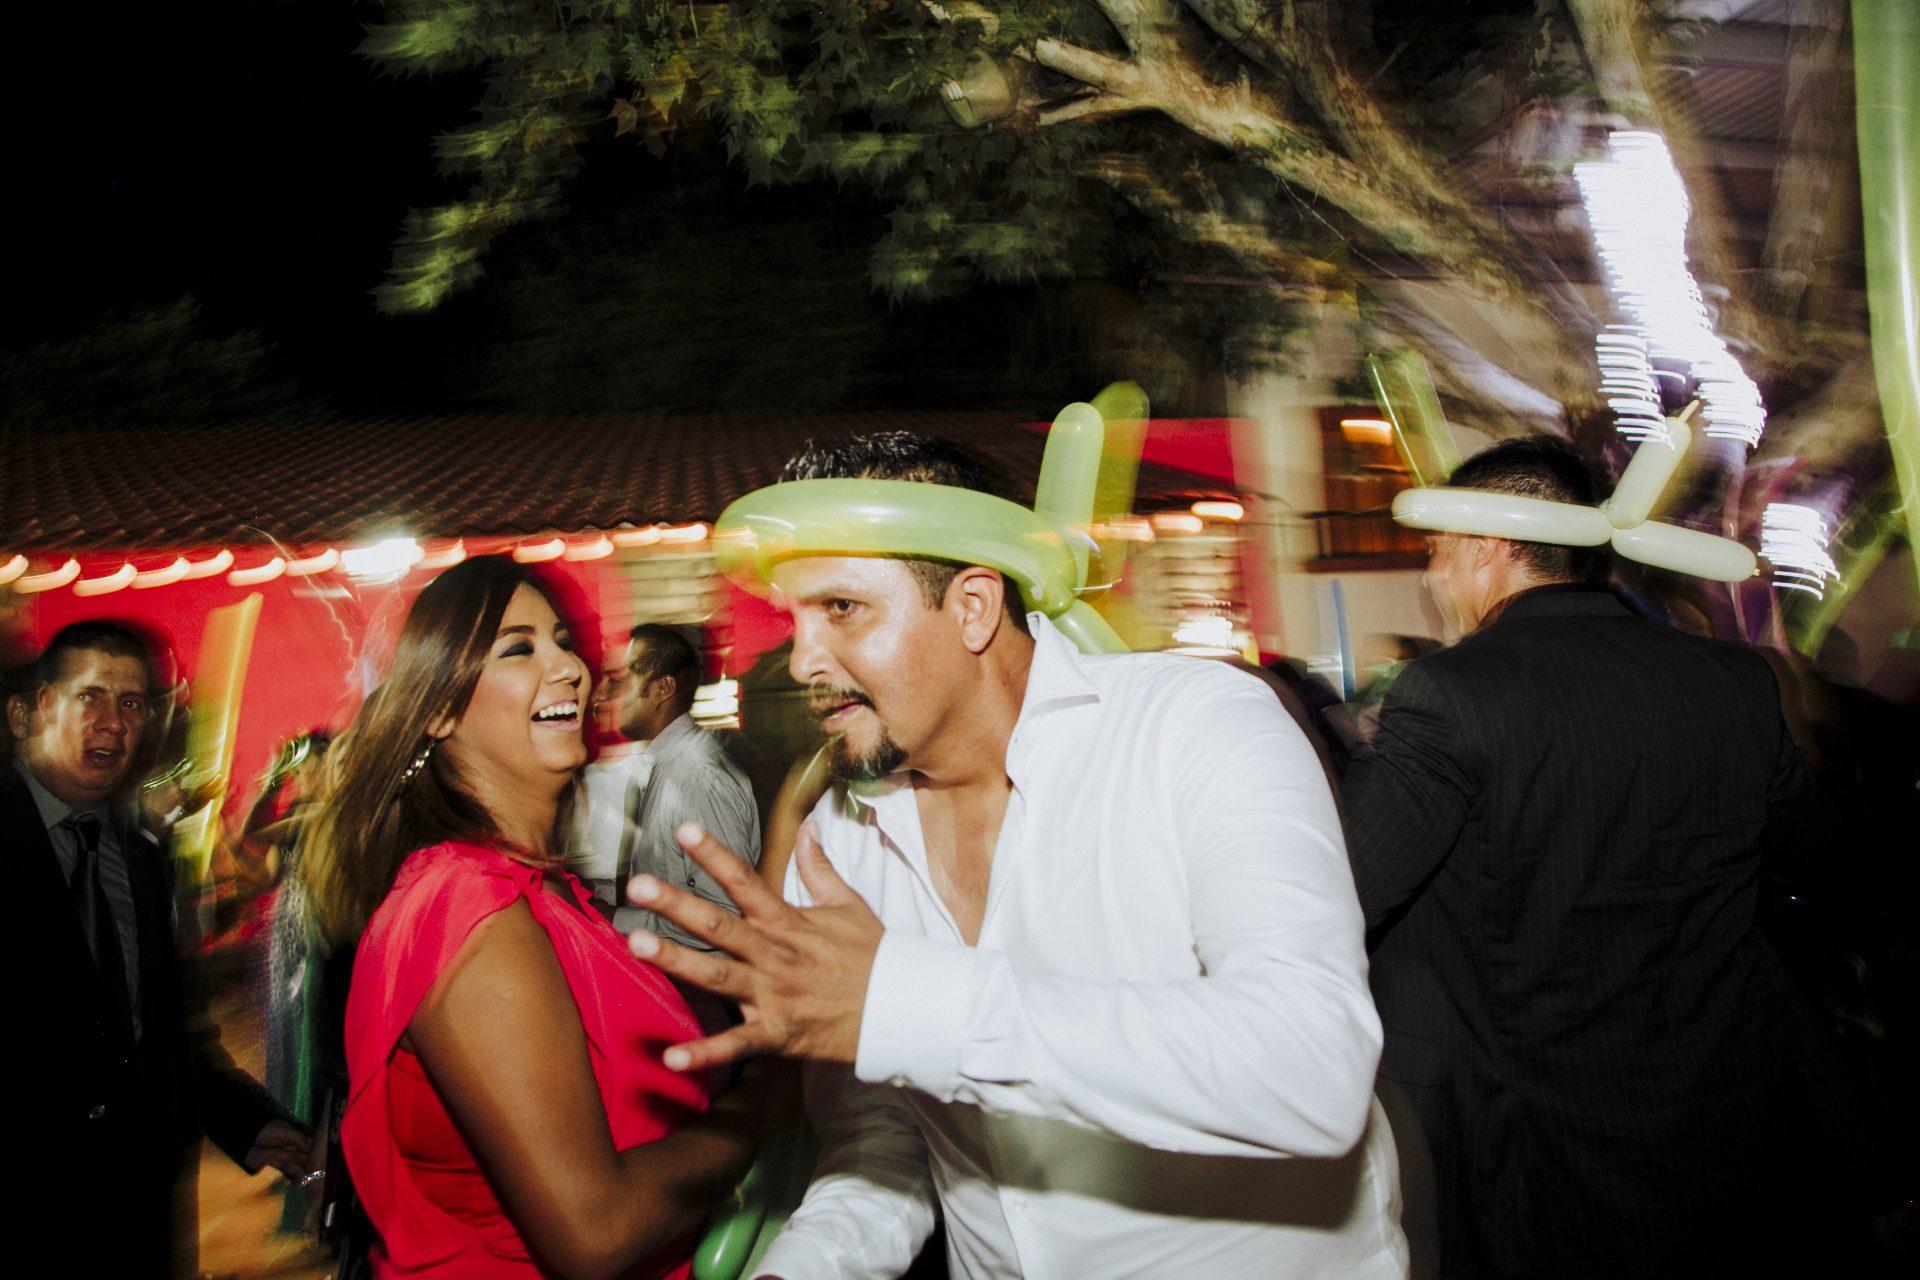 fotografo_profesional_zacatecas_chihuahua_bodas_xv_mexico-60